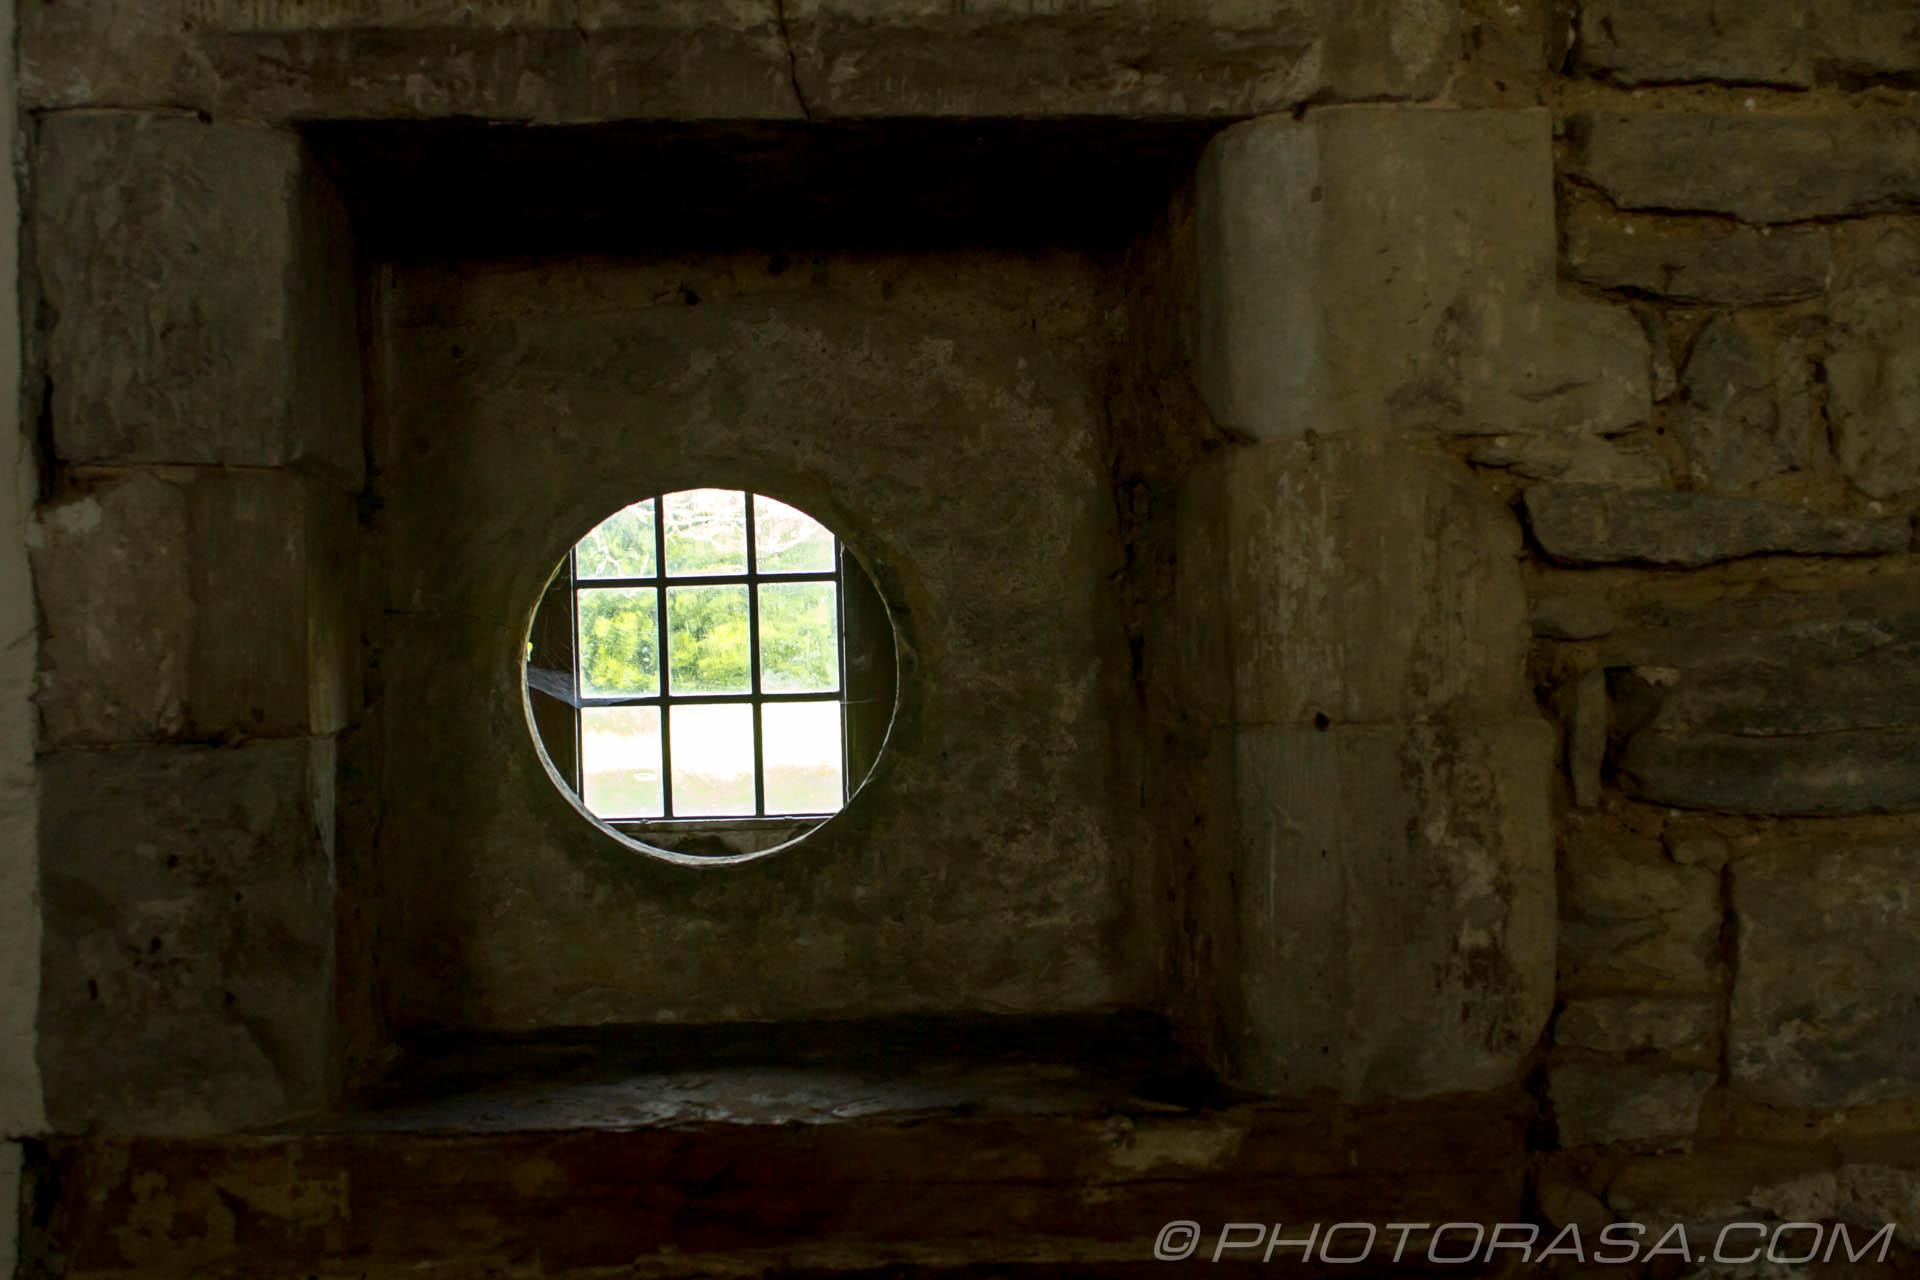 https://photorasa.com/saints-church-staplehurst-kent/the-anchorites-communication-hole/